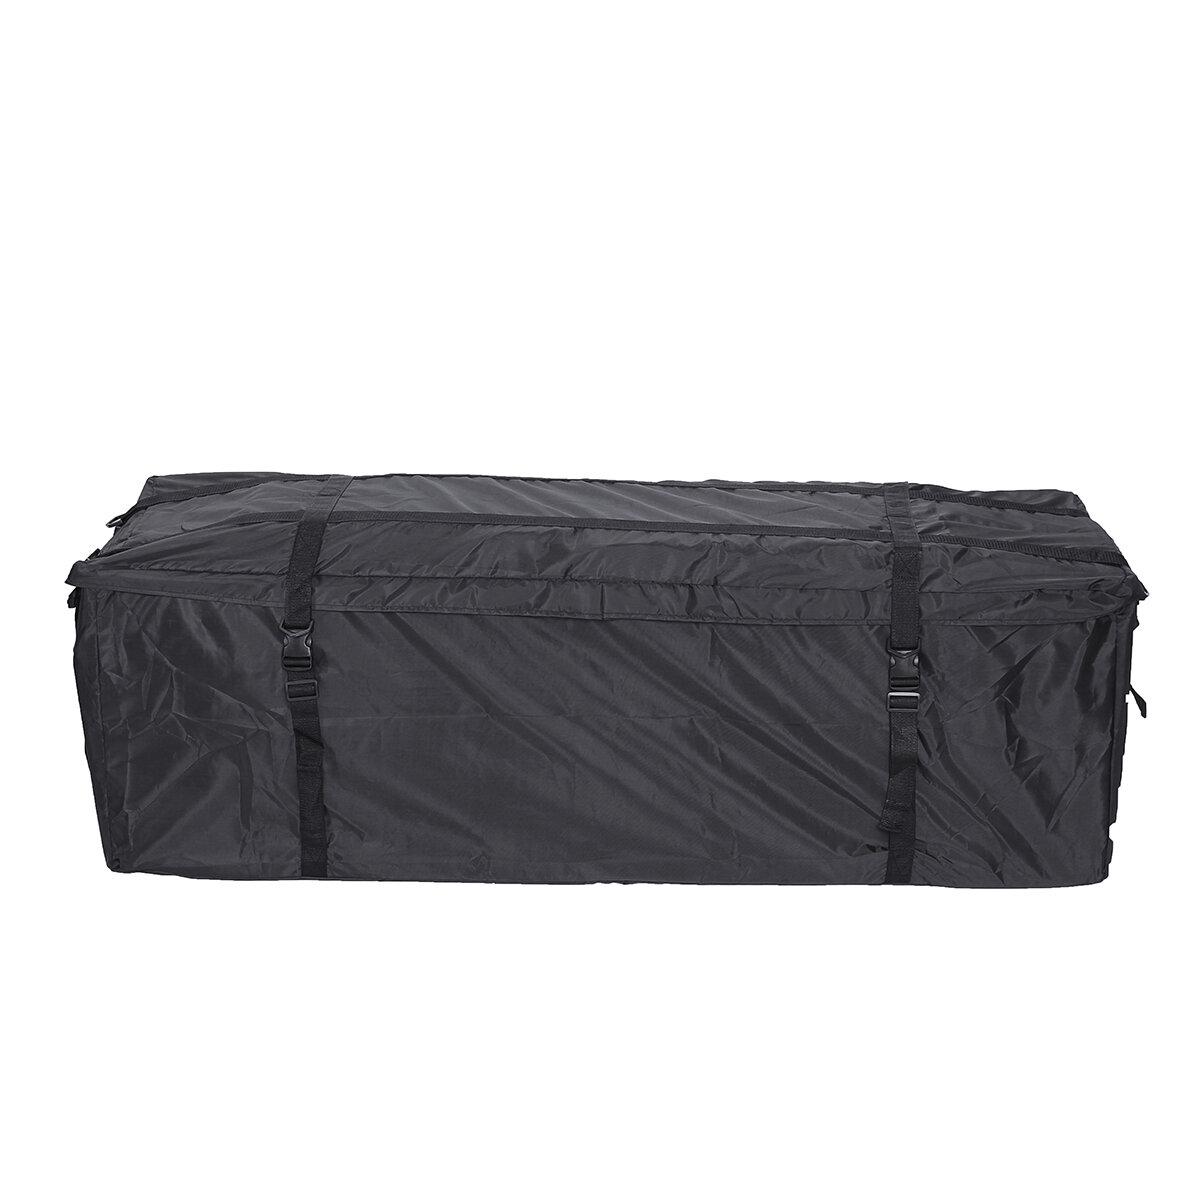 Large Waterproof Car Roof Top Rack Bag Cargo Carrier Luggage Storage Travel Tote